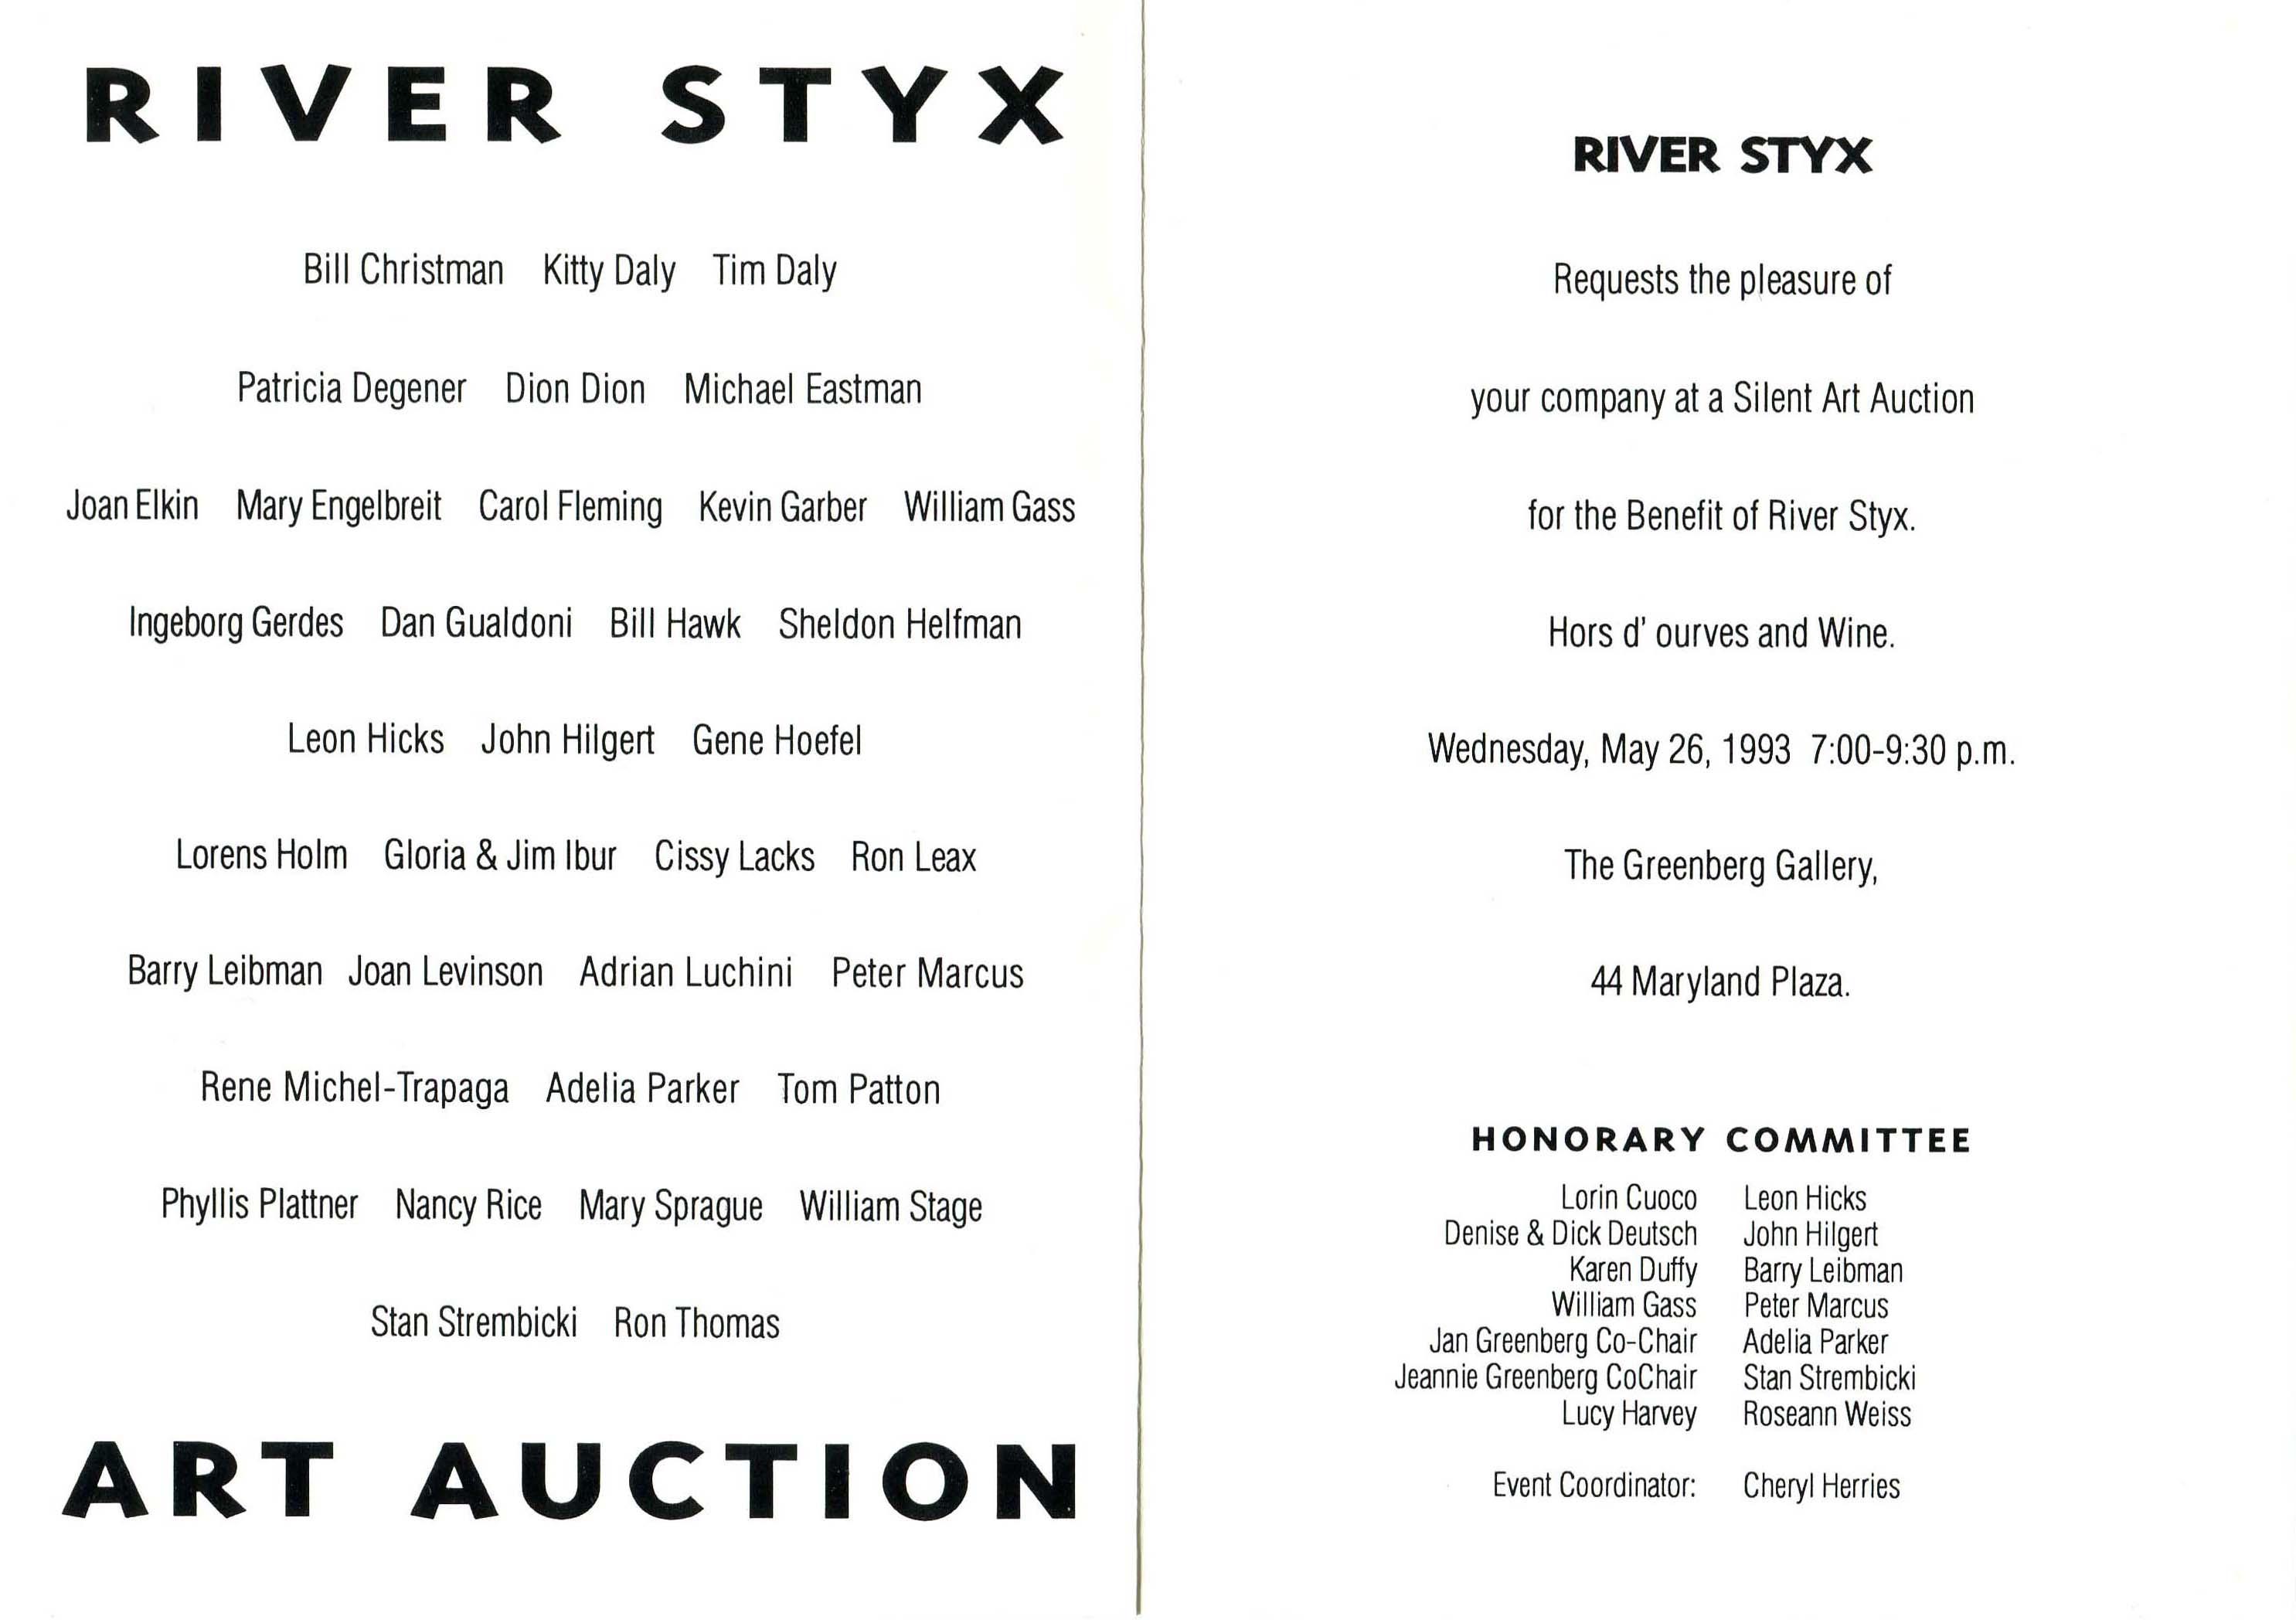 River Styx Silent Art Auction Invitation · WUSTL Digital